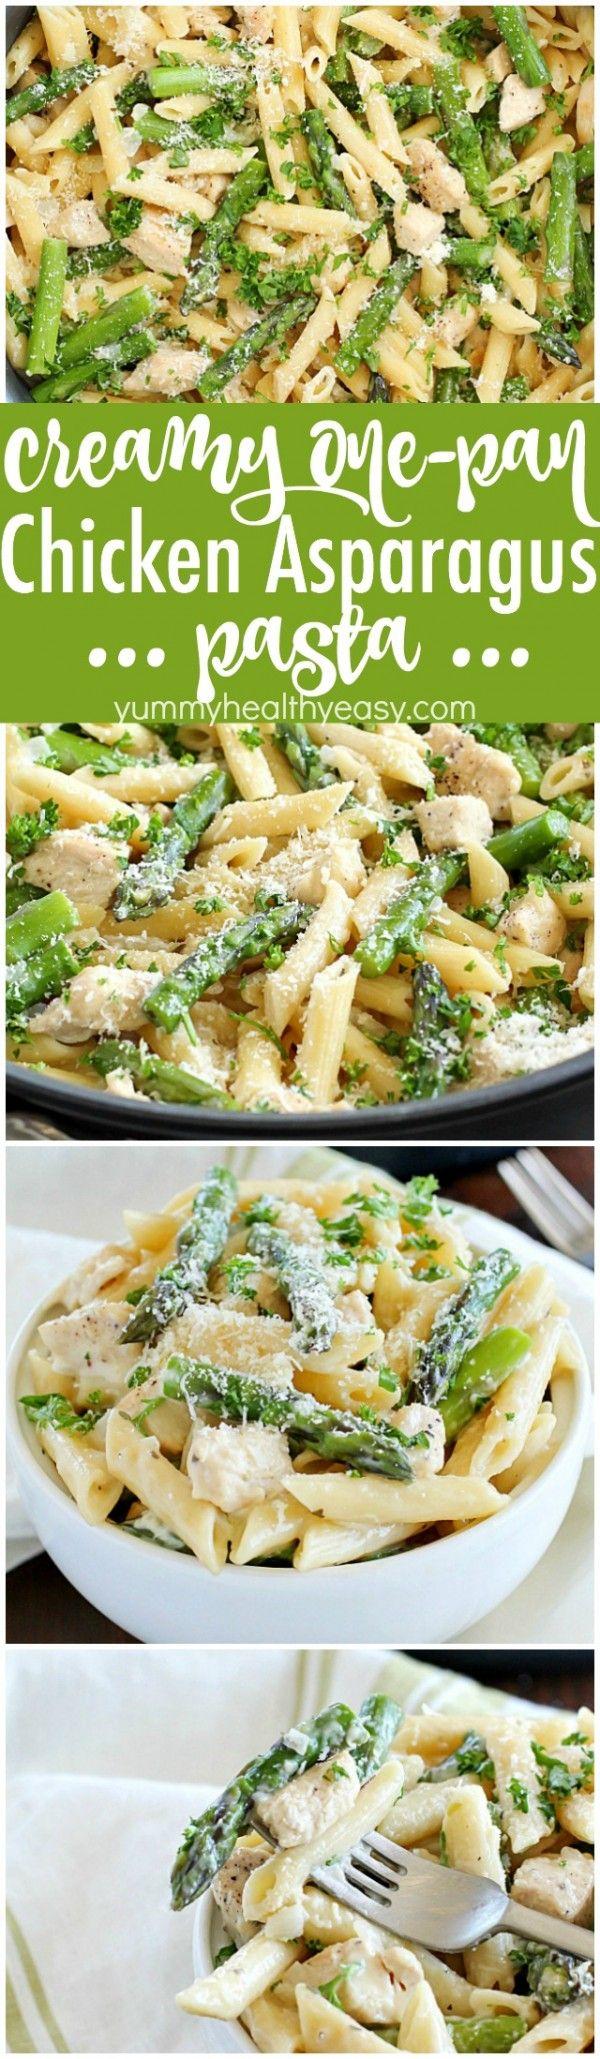 Get the recipe Creamy One-Pan Chicken Asparagus Pasta @recipes_to_go